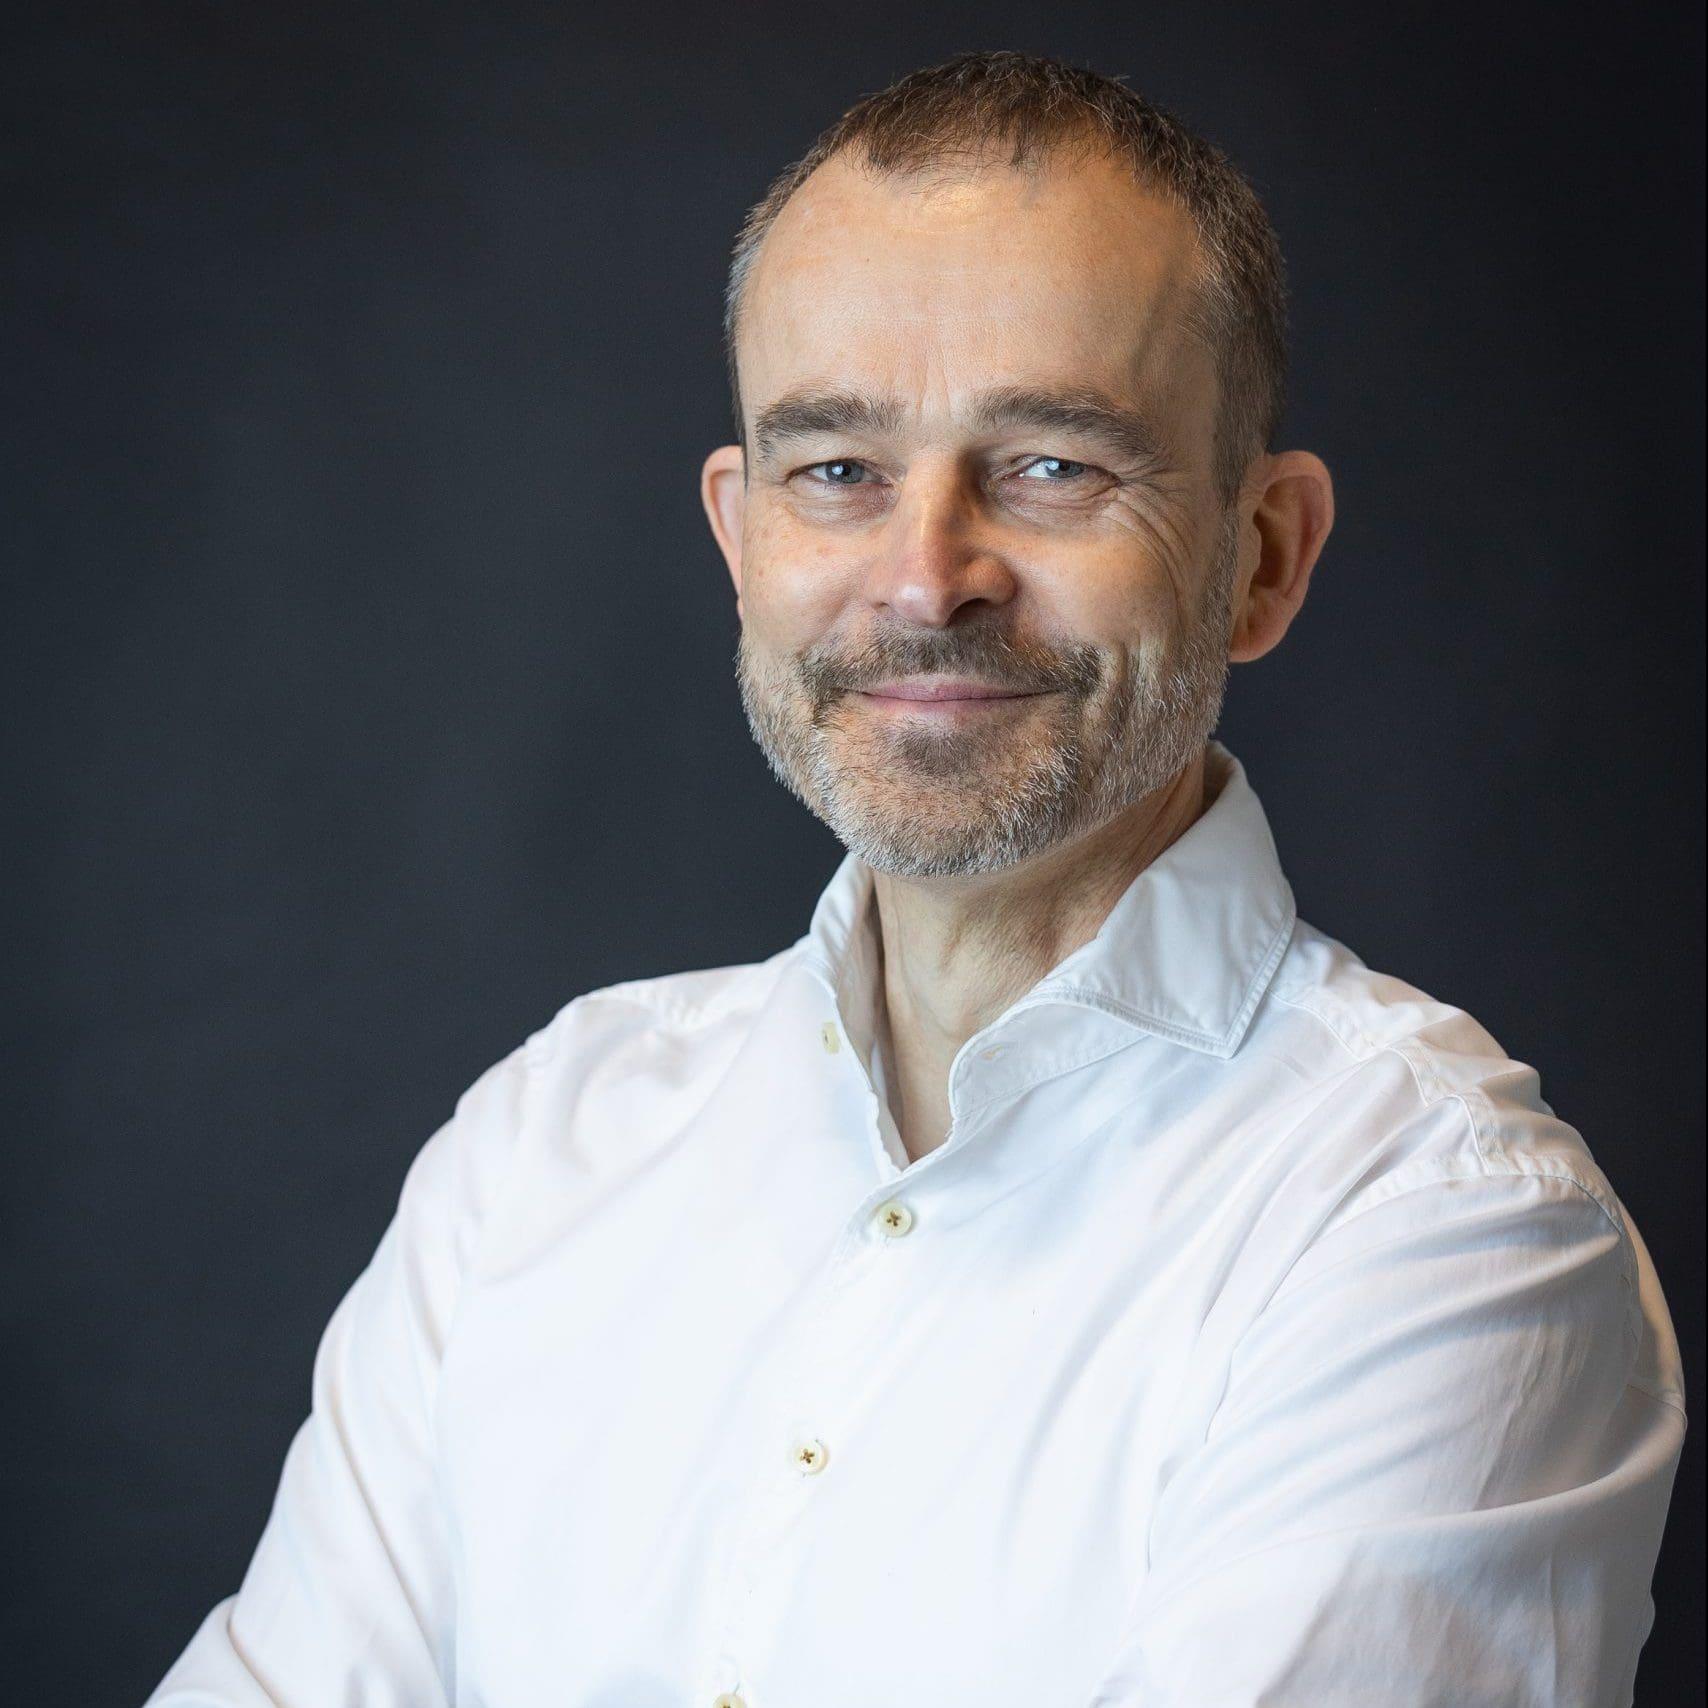 Morten Rahbek Kreilgaard